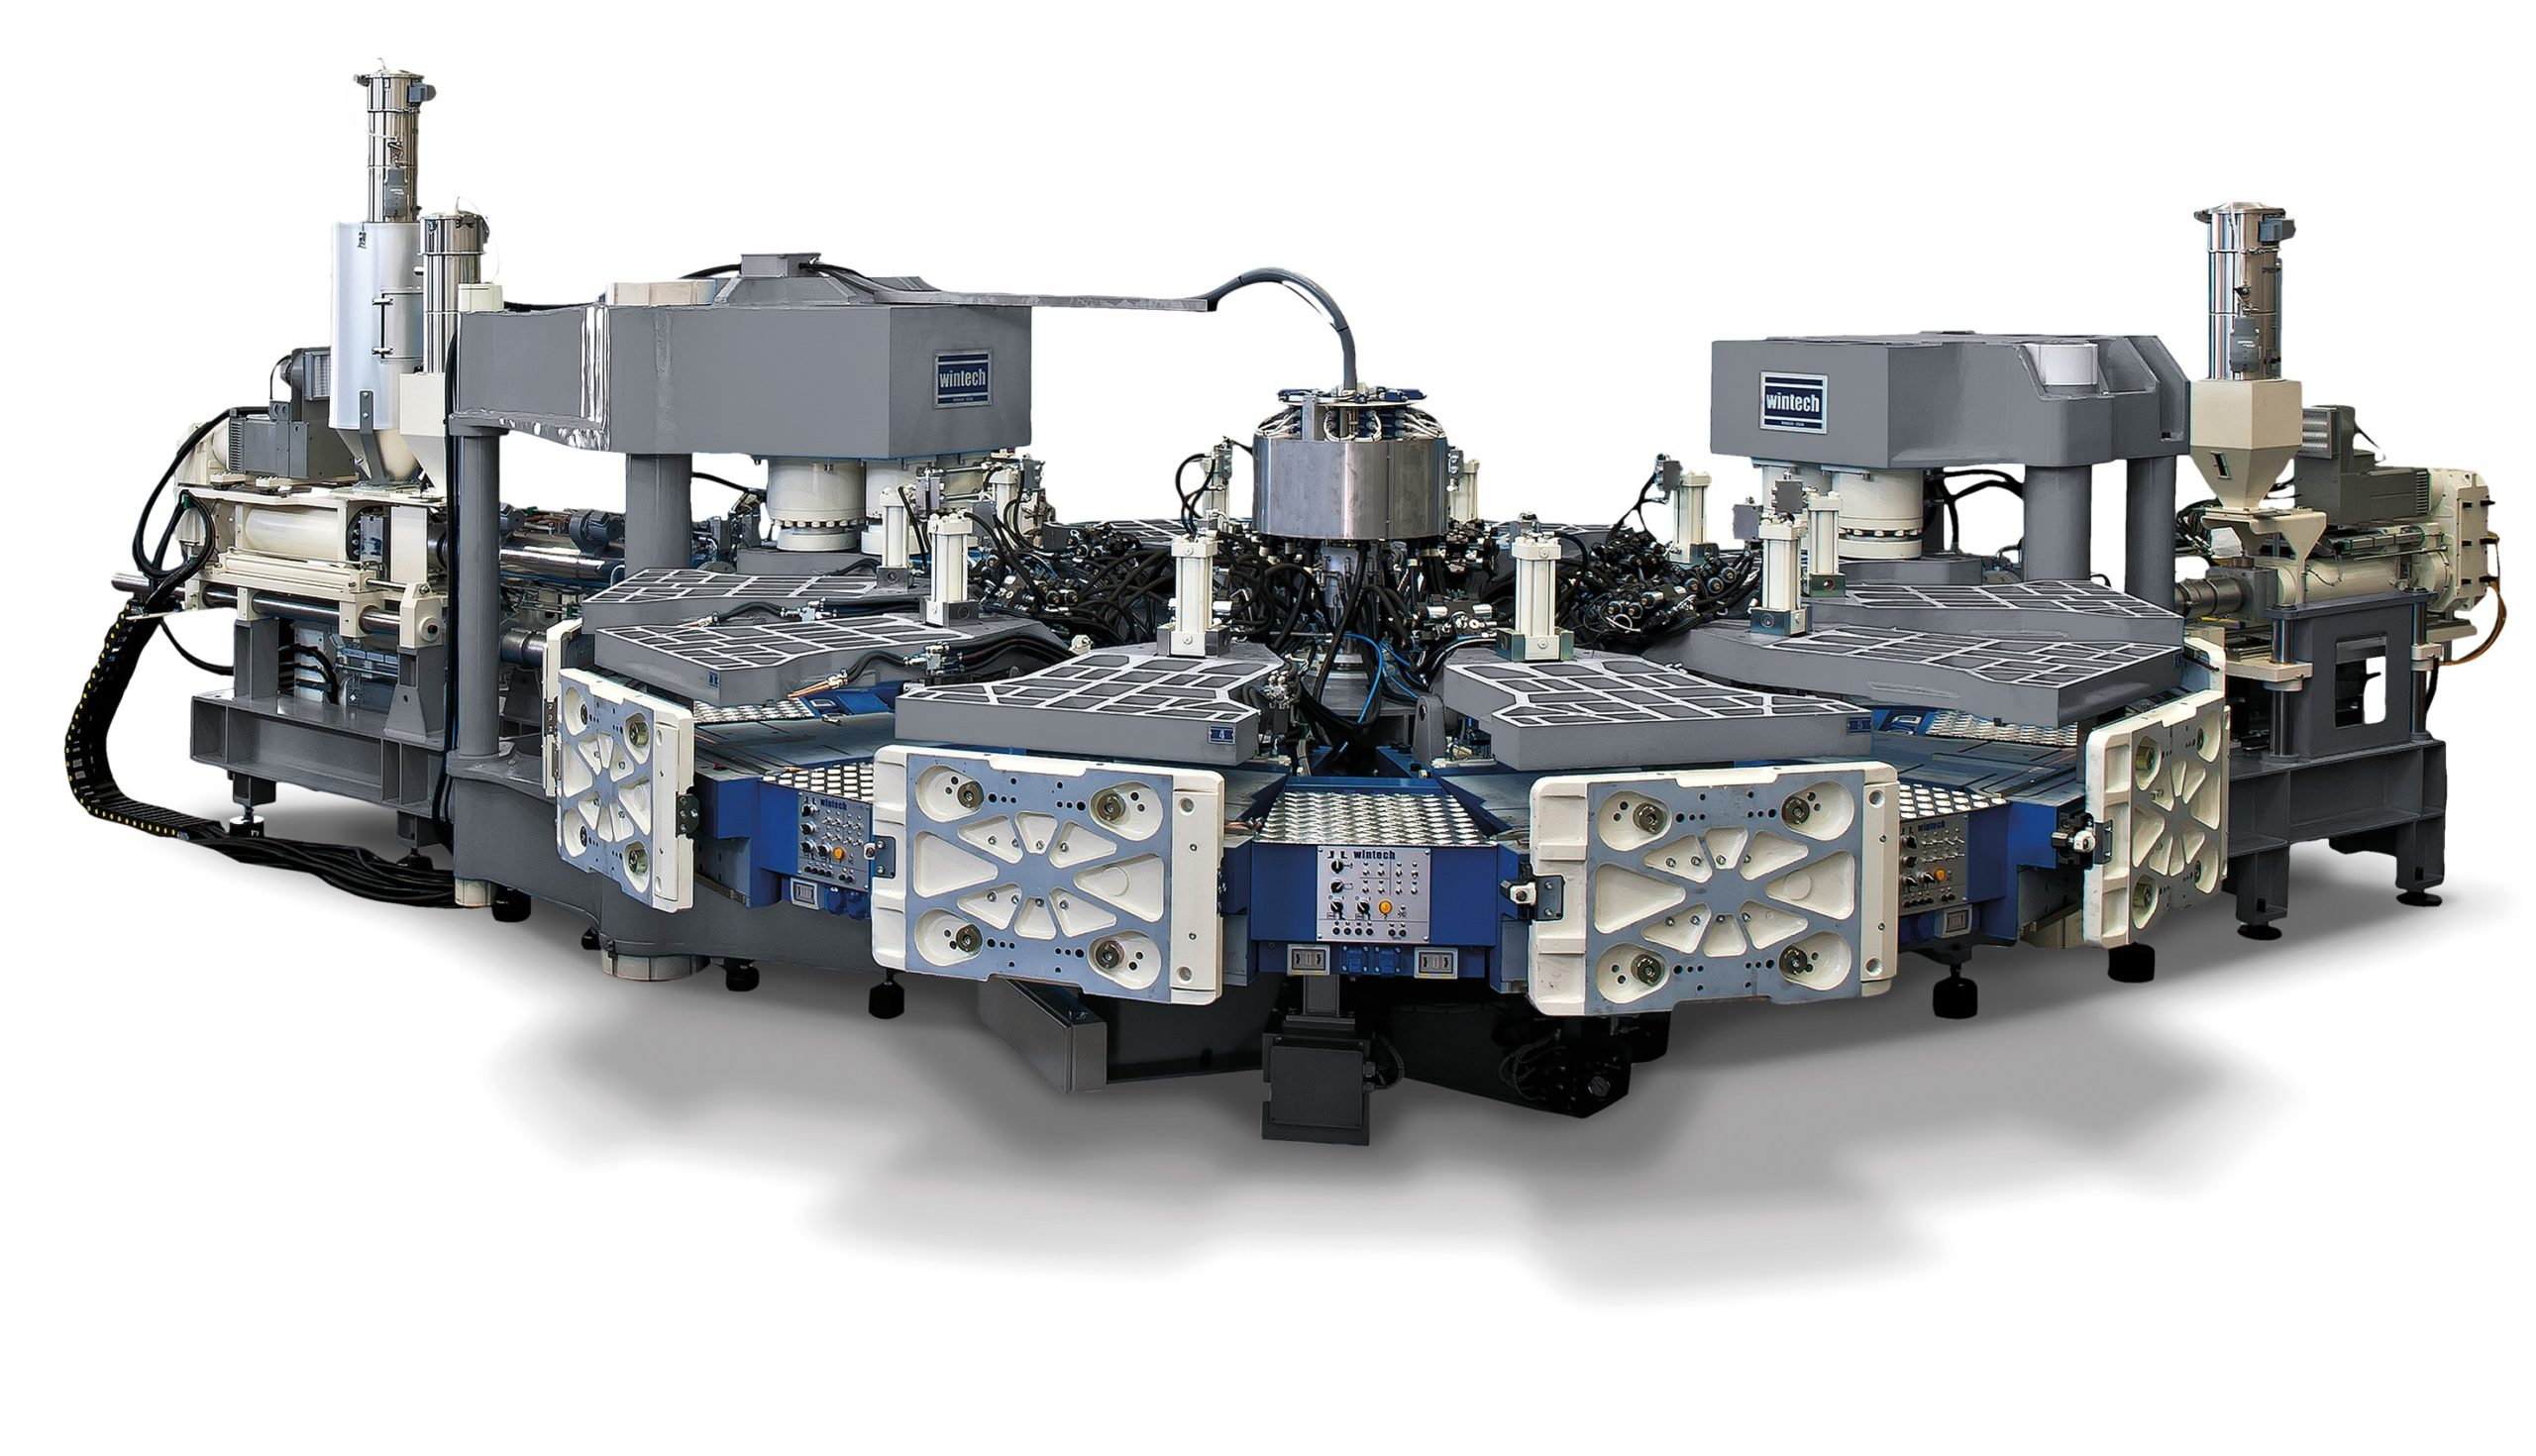 macchina-iniezione-stivali-wlx203-wintech